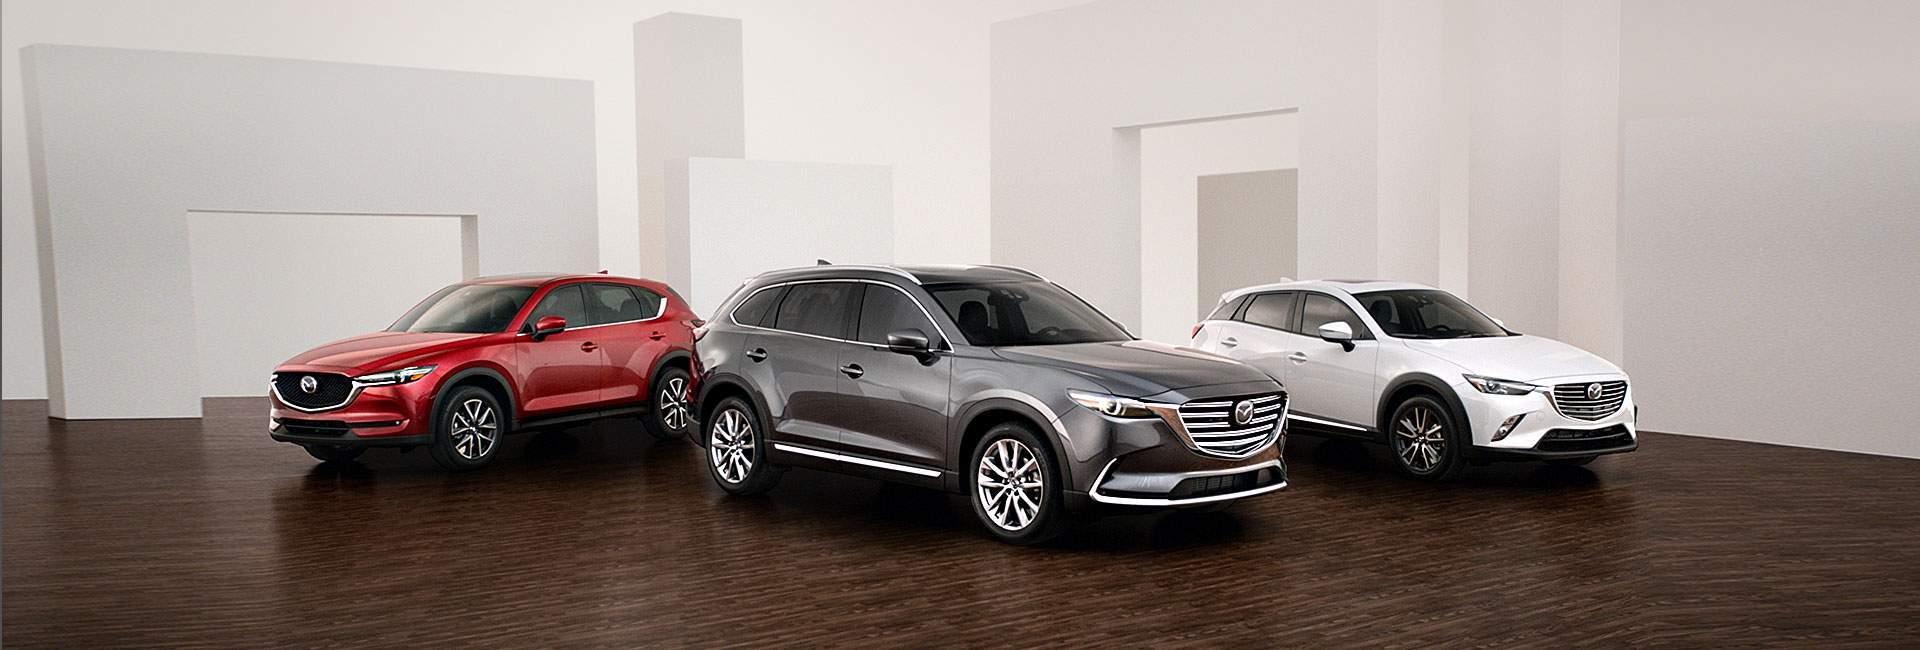 100 Mazda Range Of Vehicles Mazda Design Chief